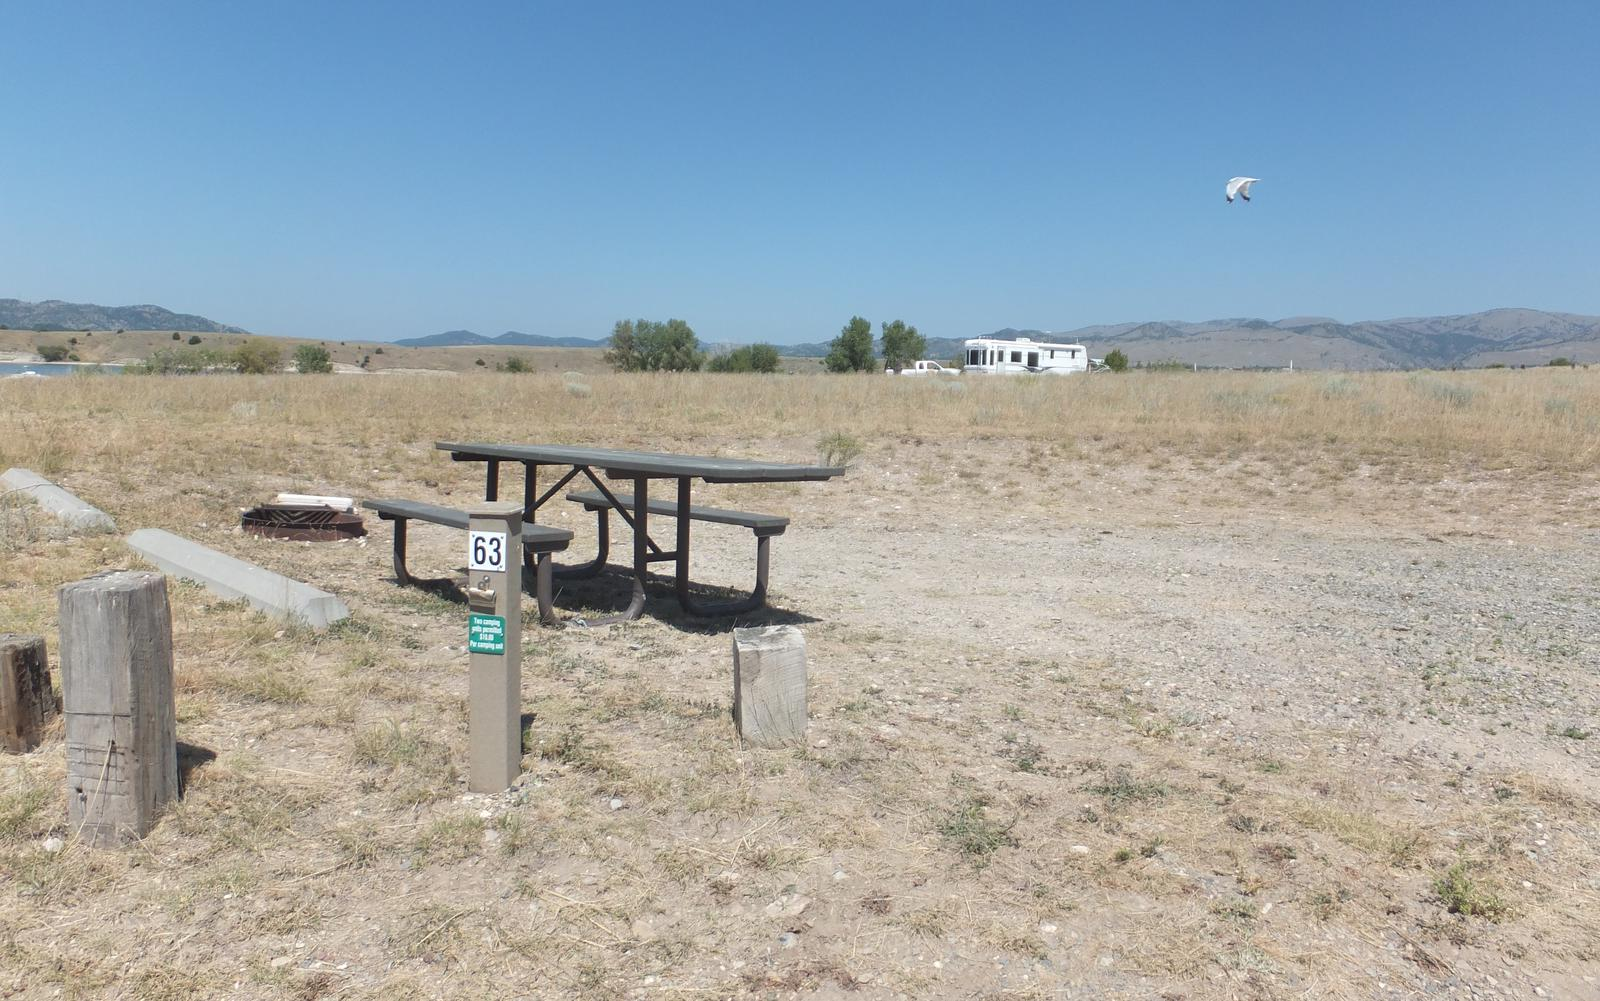 Hellgate Campground - Campsite 63